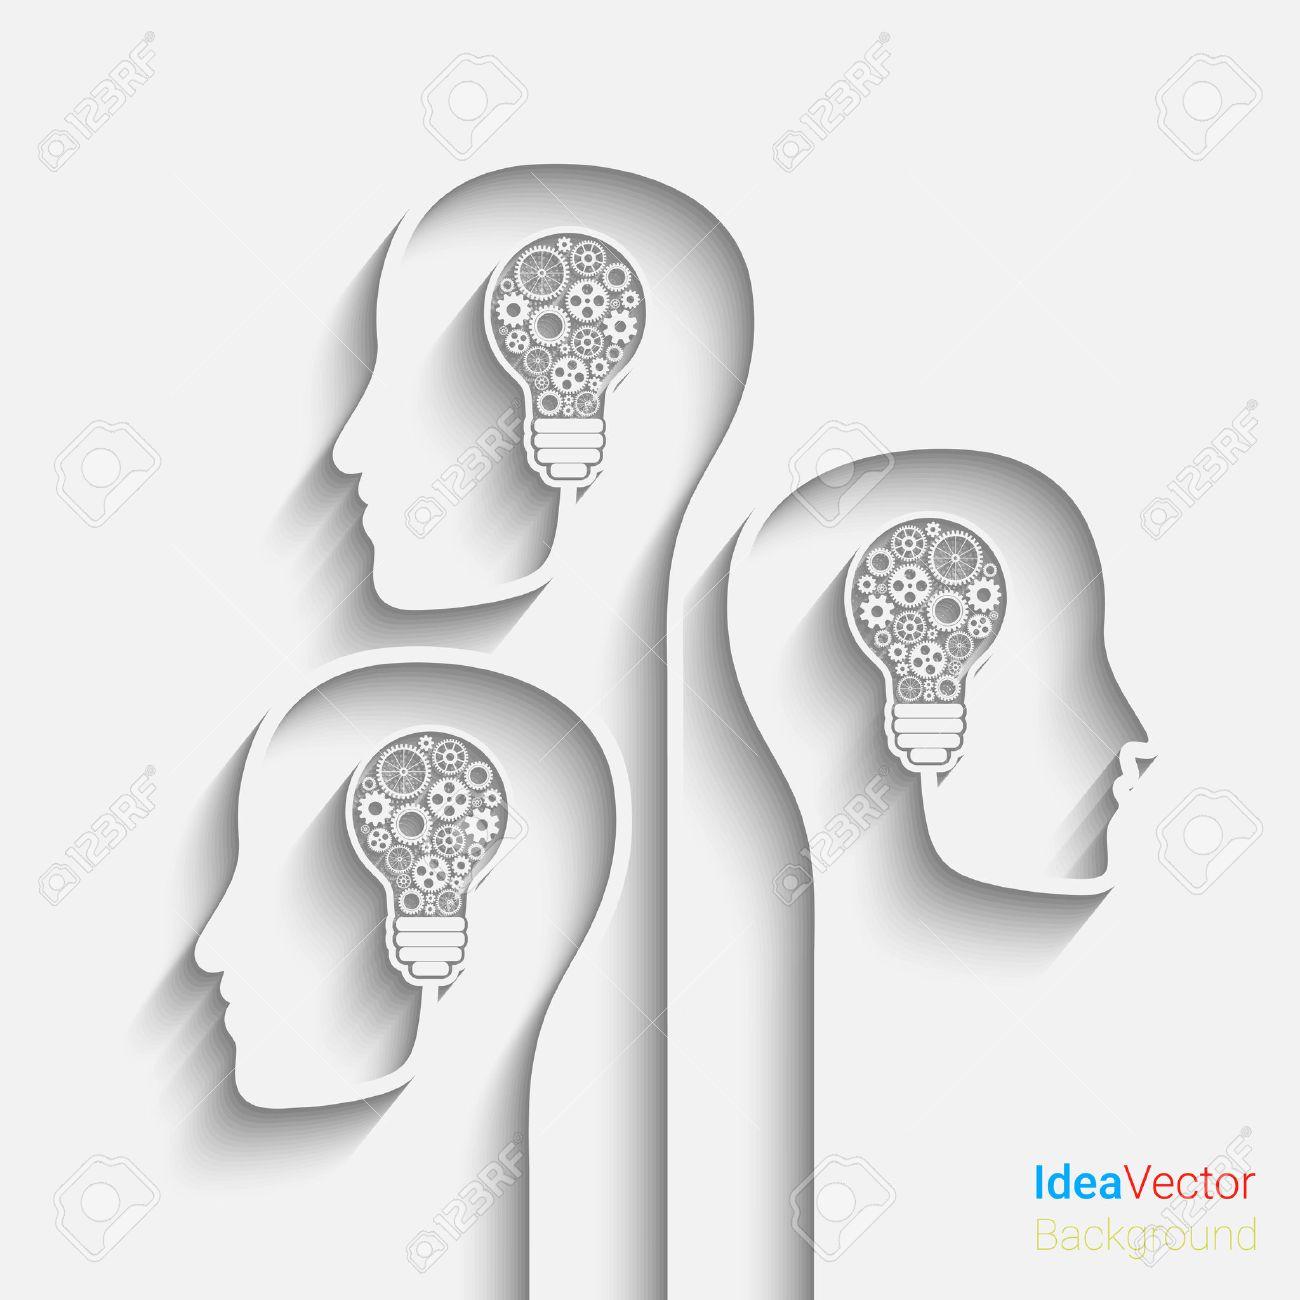 Human Head Creating A New Idea. Vector For Your Design Stock Vector    37858227